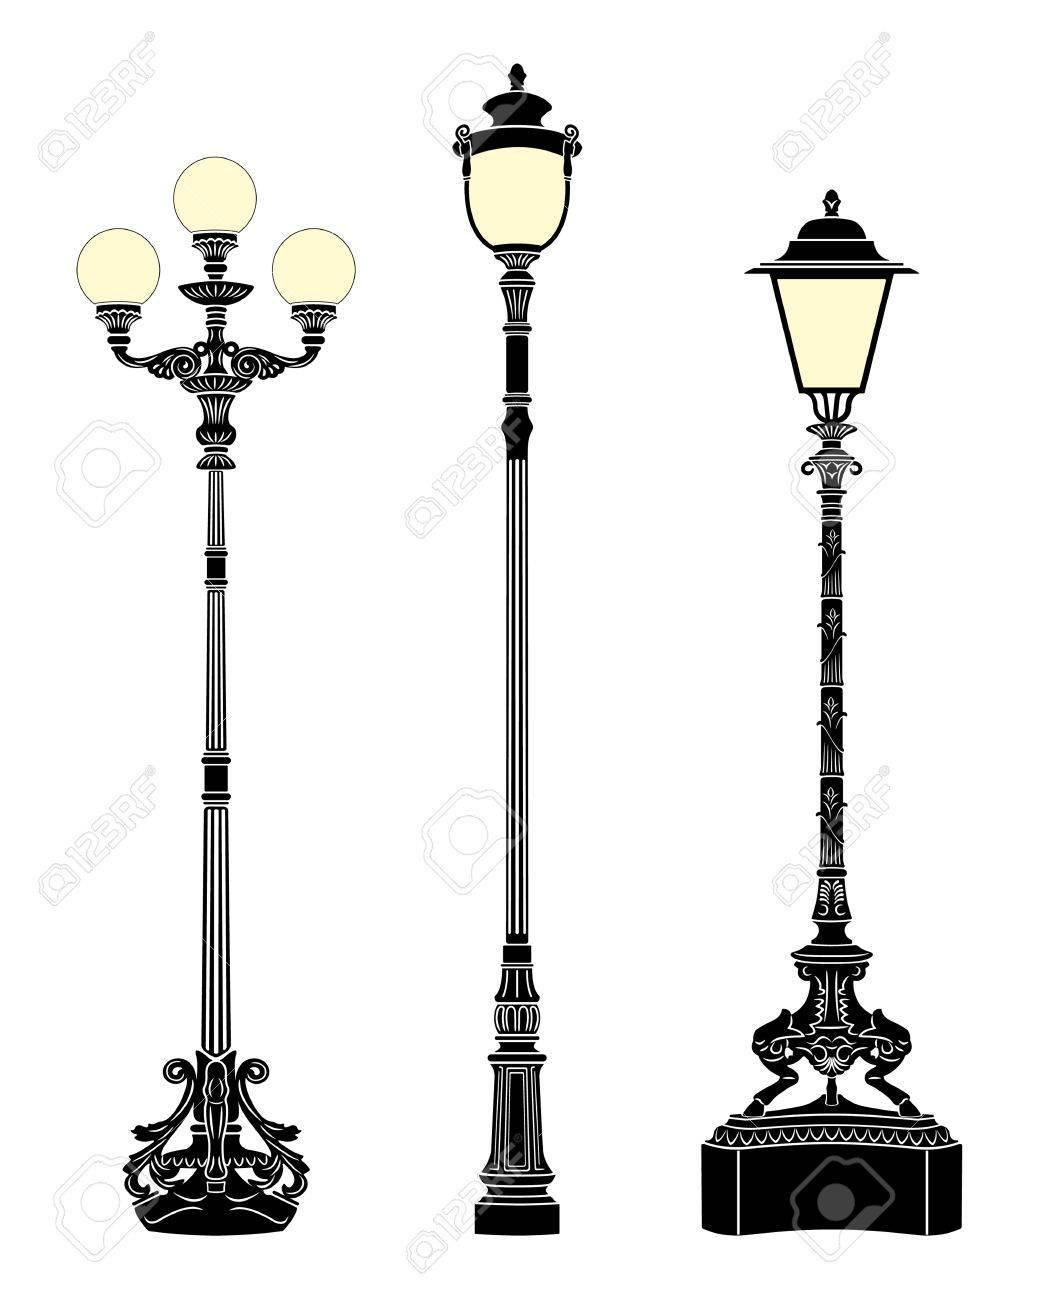 Italian forged iron elegant street lamps Stock Vector - 4232861